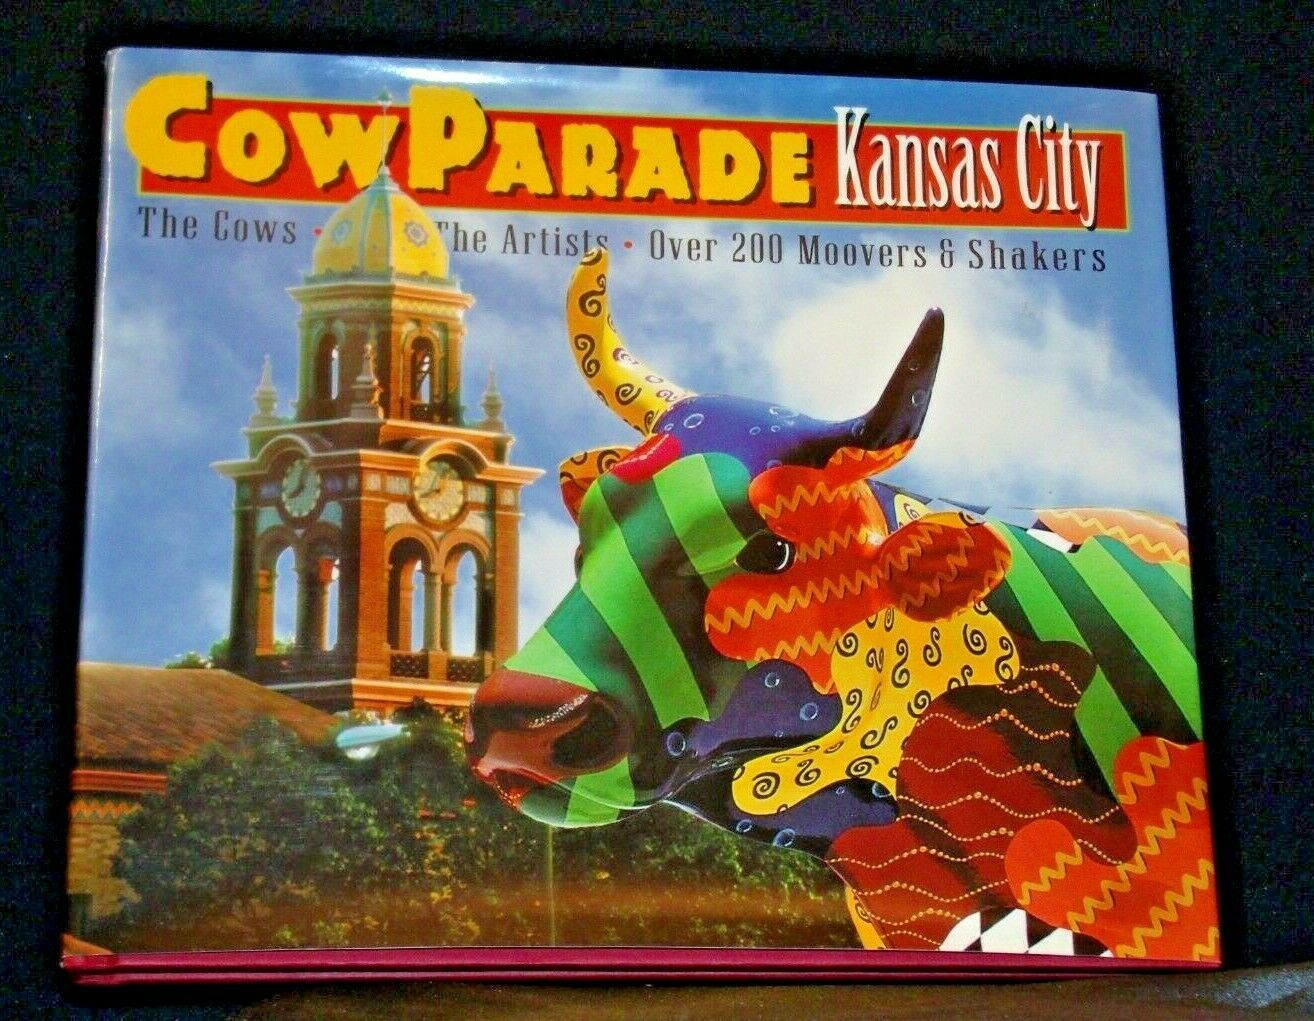 Hard Cover Westland Giftware CowParade Kansas City Book AA-191937 Vintage Colle